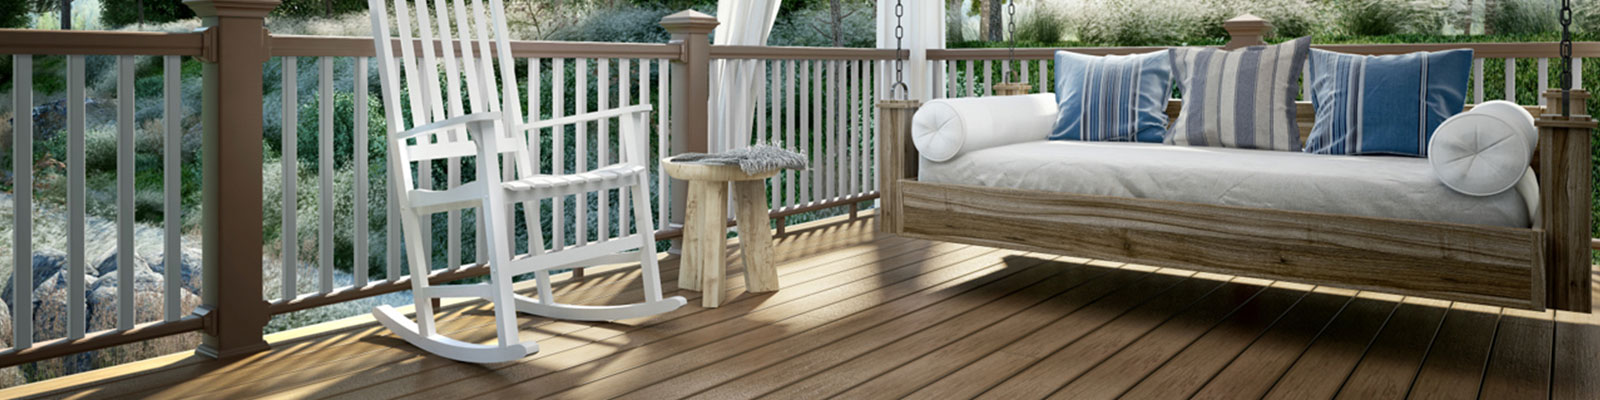 Deck Planning 101 - Akins-Brewer Lumber